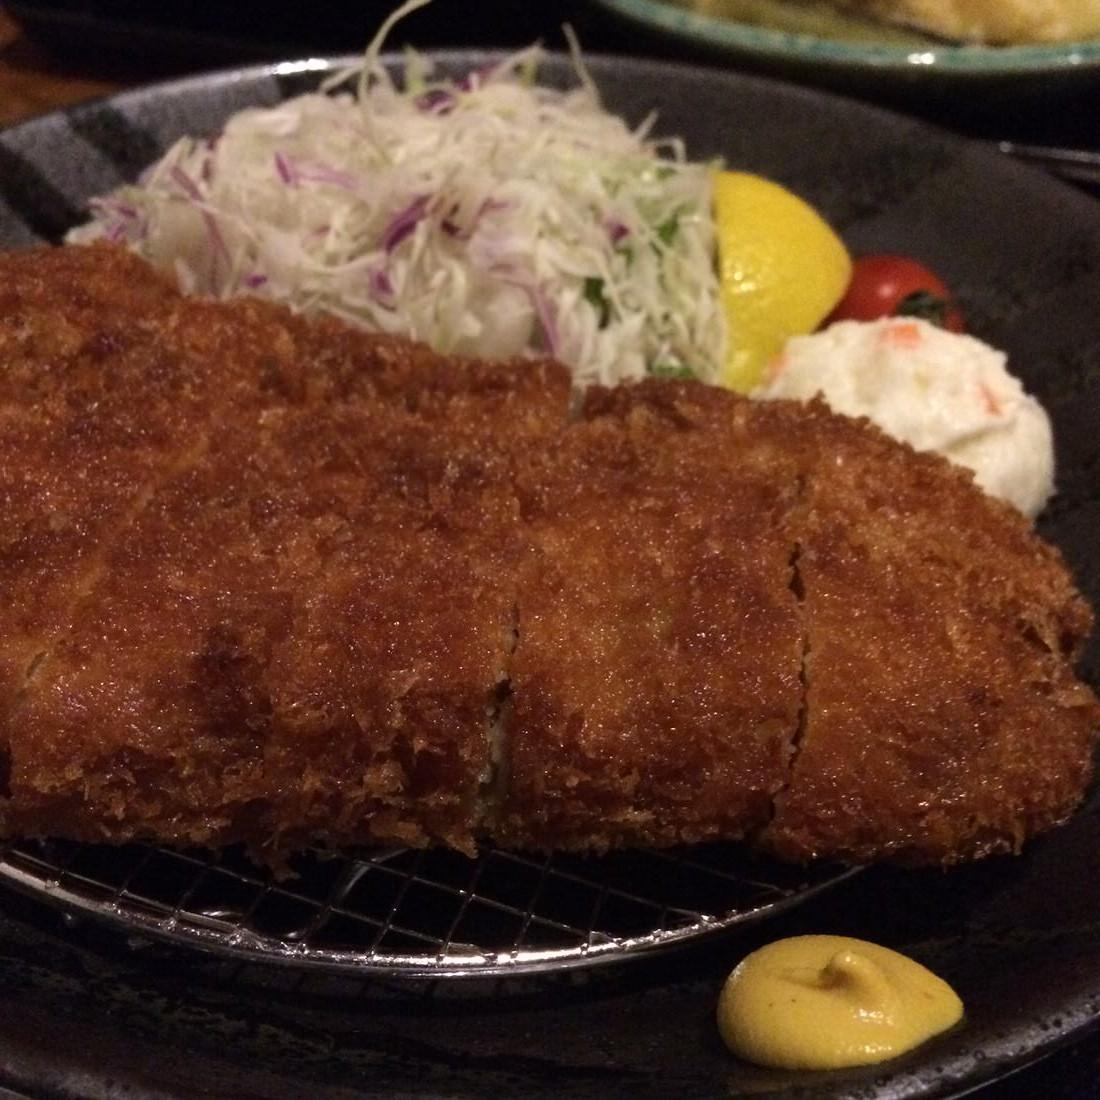 【TDL】予約可能な和食れすとらん北斎でくつろぎながらディナーがおすすめ